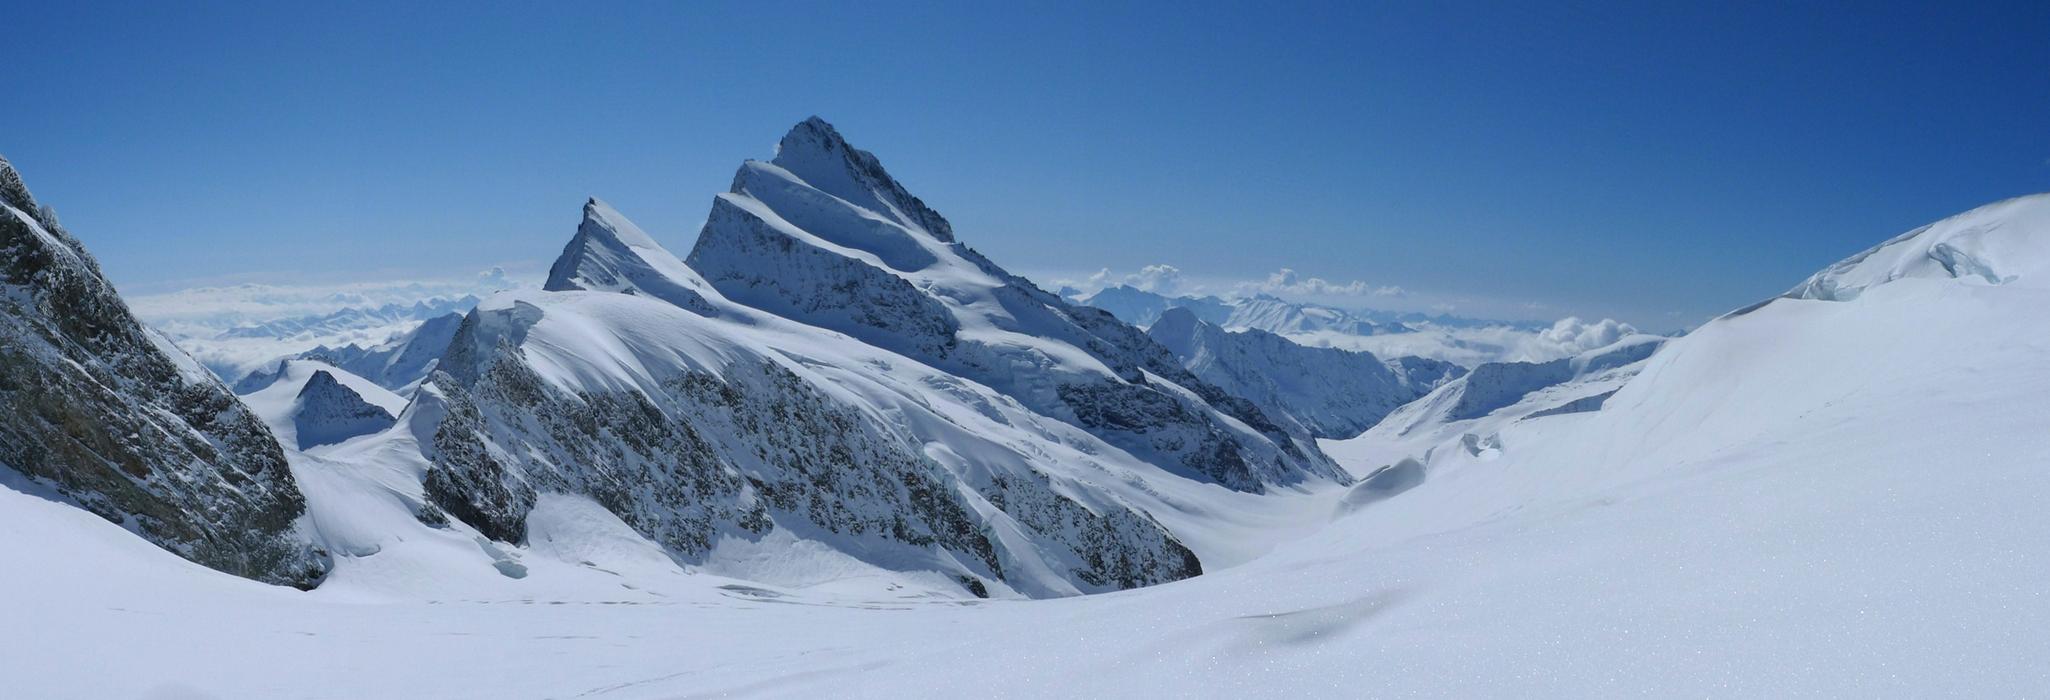 Finsteraarhorn Berner Alpen / Alpes bernoises Switzerland panorama 05